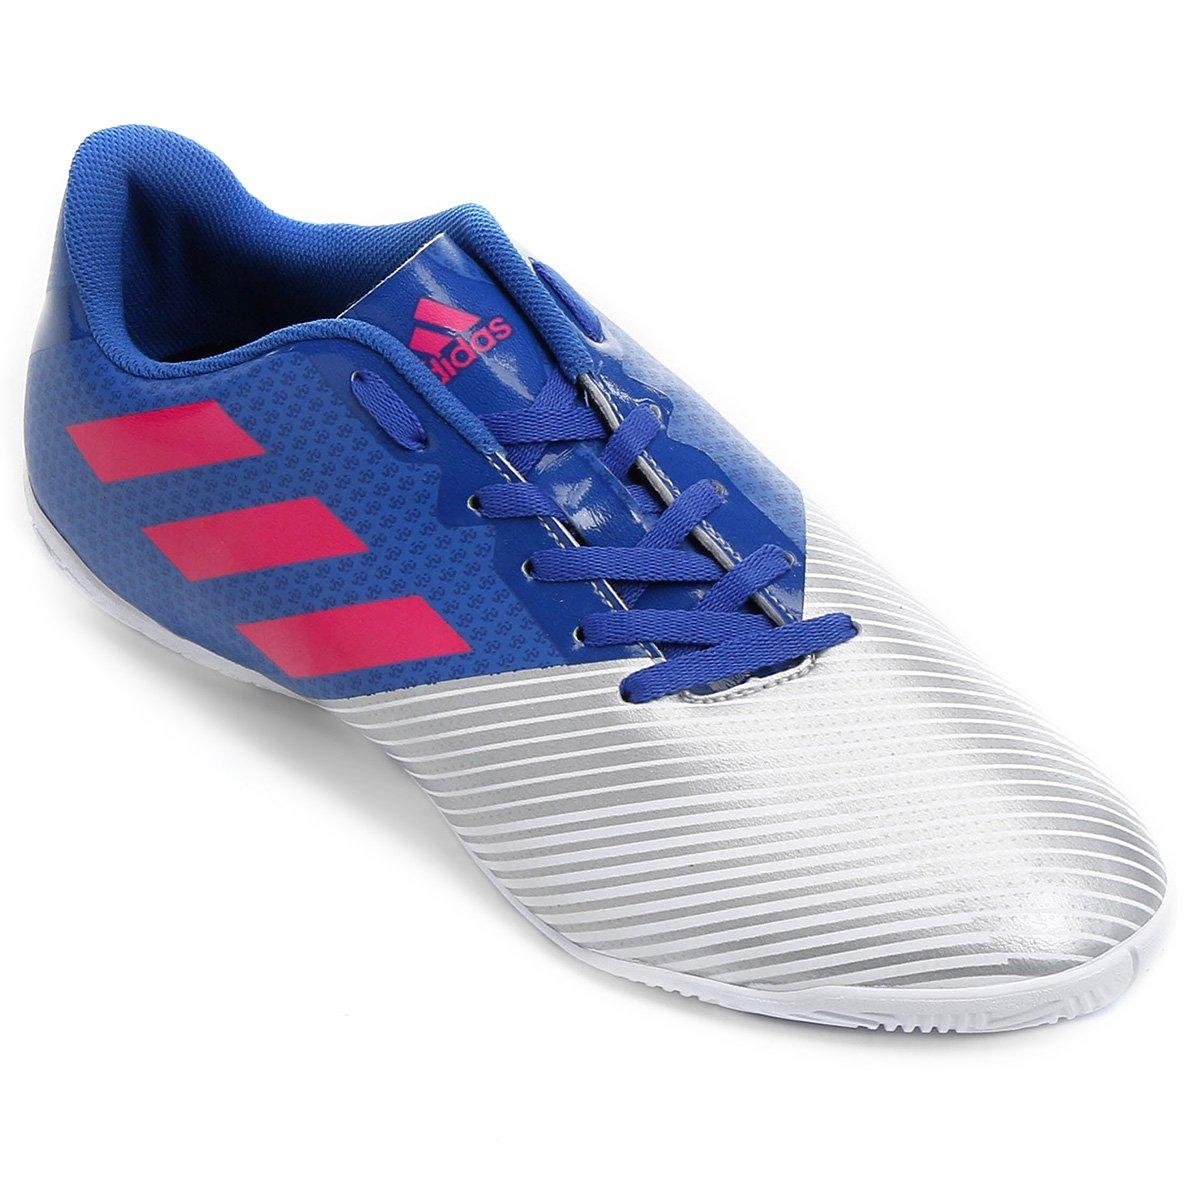 ccec57f5ef Chuteira Futsal Adidas Artilheira 17 IN - Azul e Prata